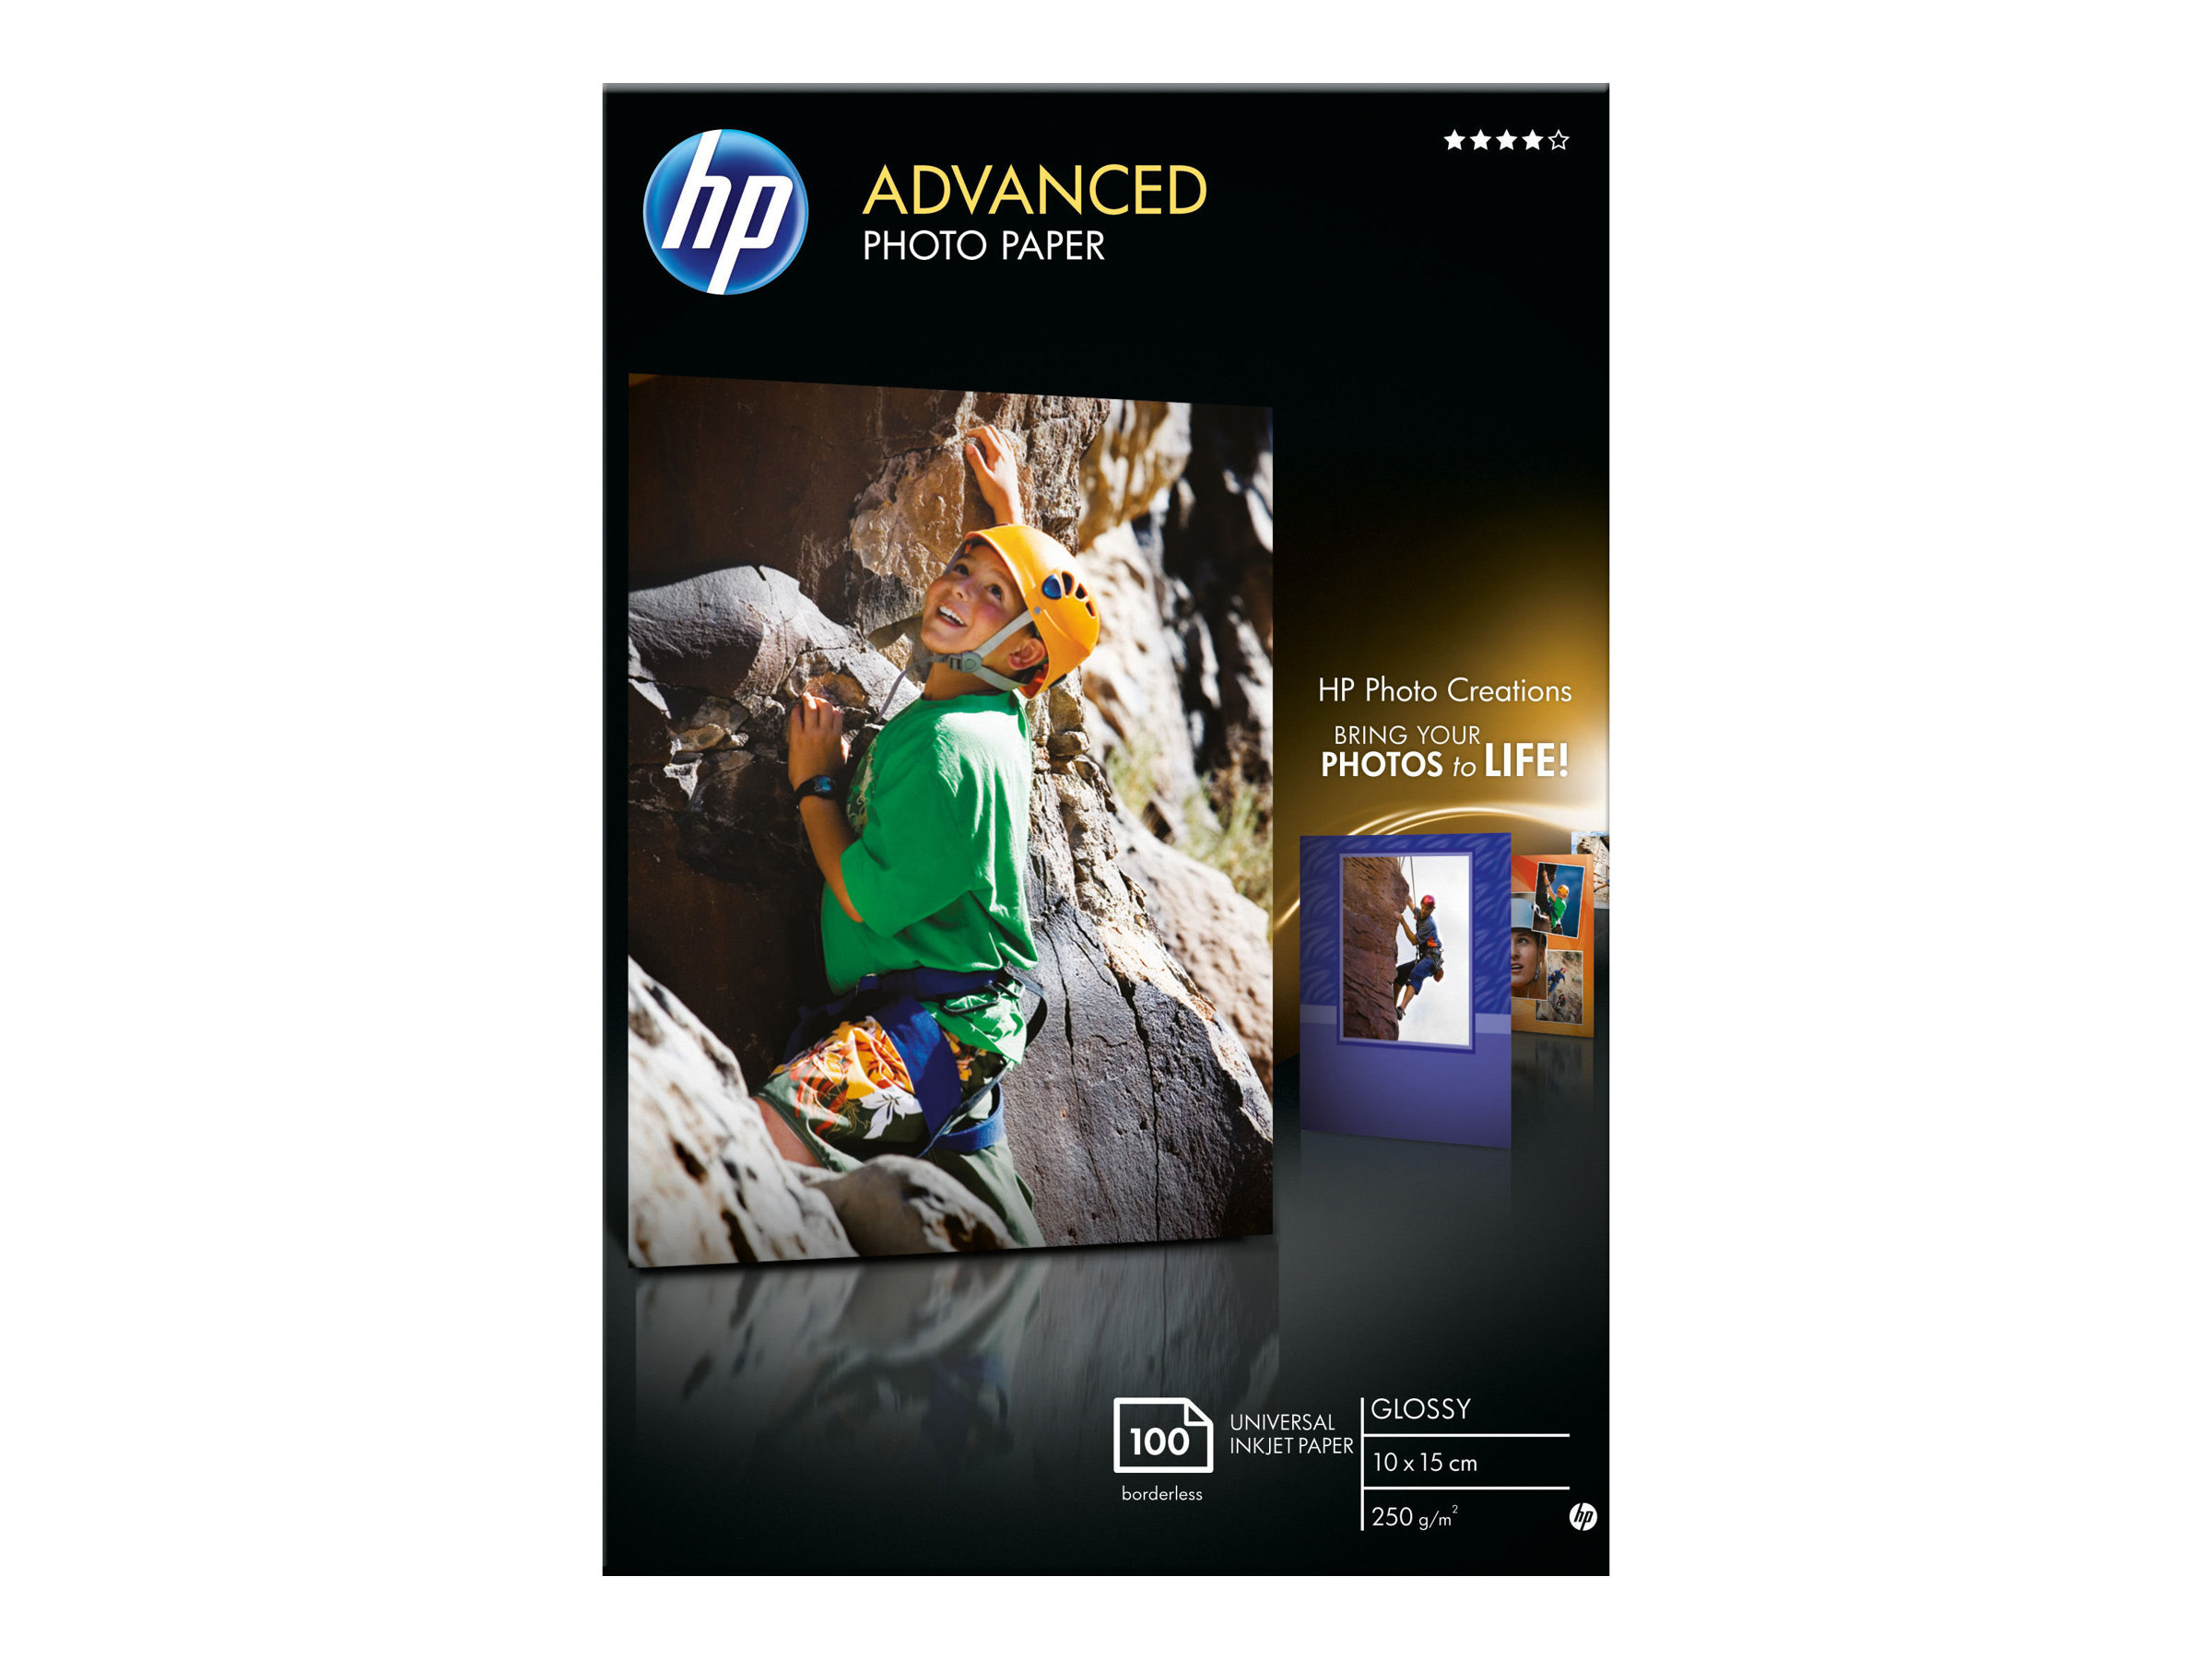 Hp advanced glossy photo paper glaenzend 100 x 150 mm 250 g m 100 blatt fotopapier fuer deskjet 2622 envy 50xx 76xx officejet 52xx 80xx photosmart b110 wireless b110 294422 q8692a